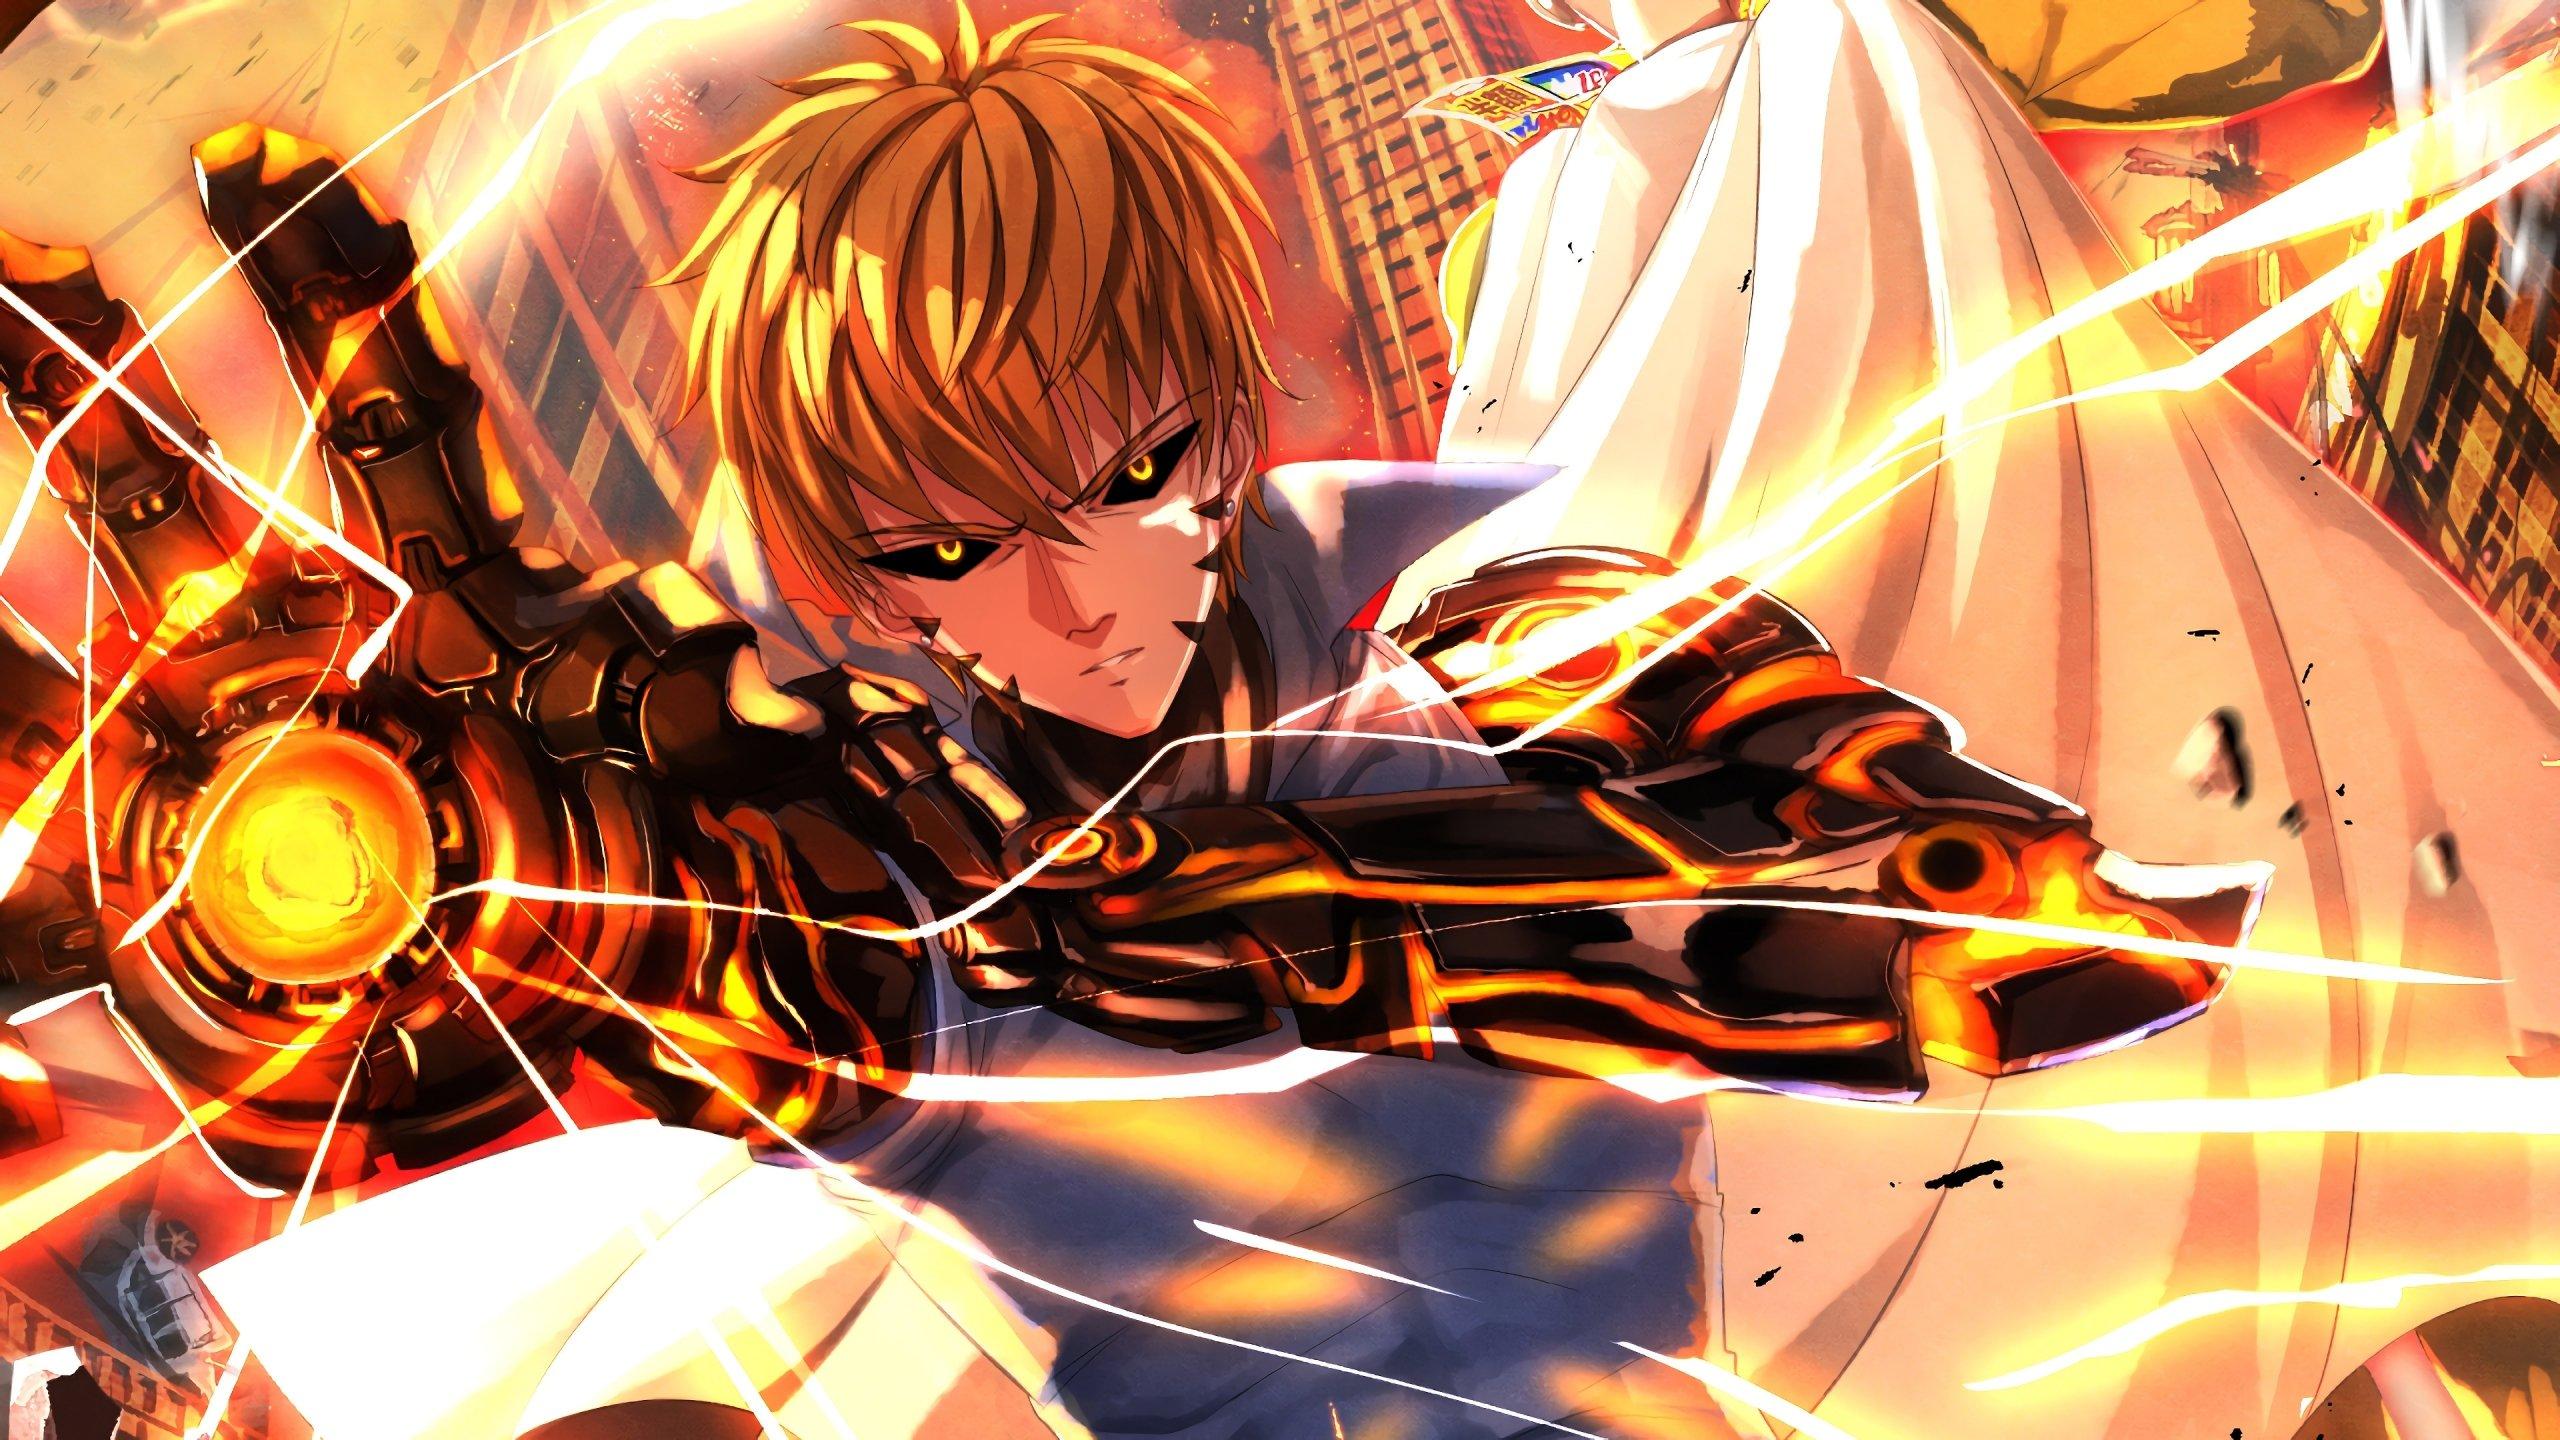 Genos One Punch Man Anime Fondo De Pantalla 4k Ultra Hd Id3220